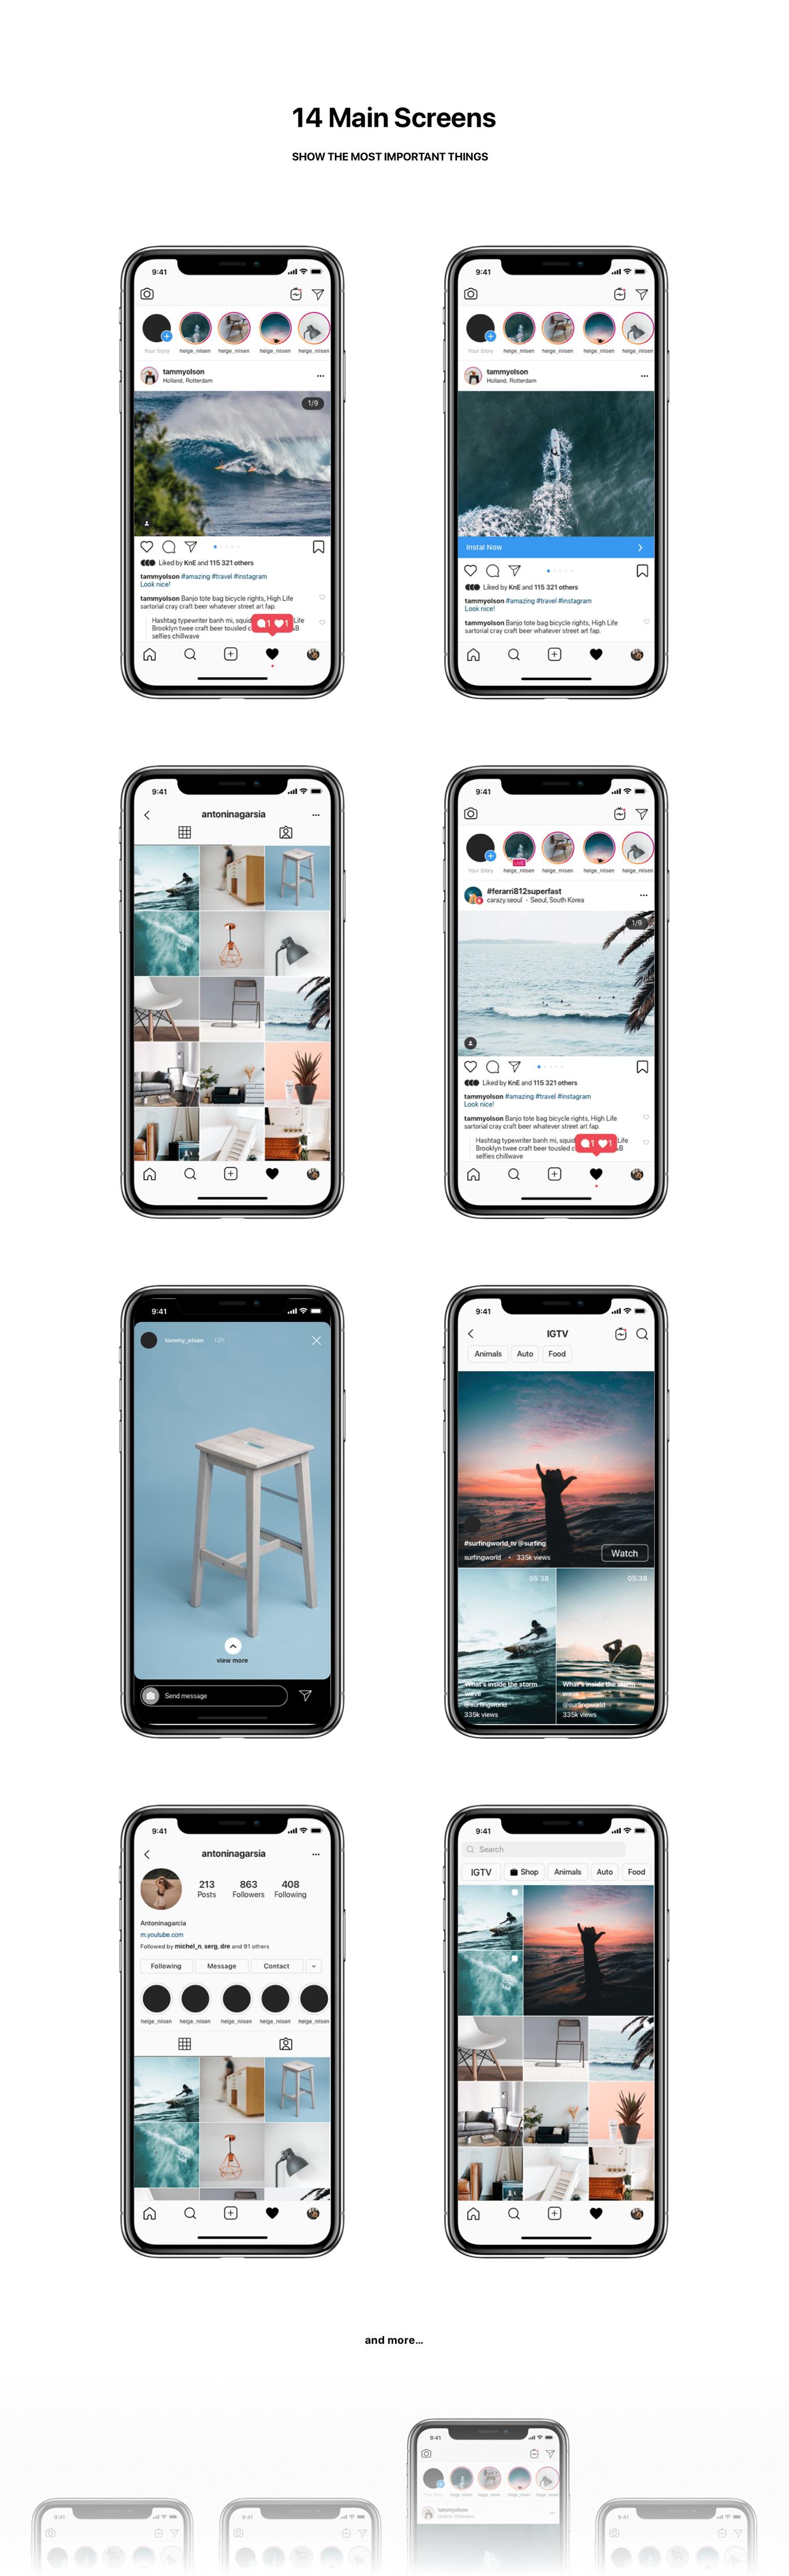 Instagram Mockup Download All Screens